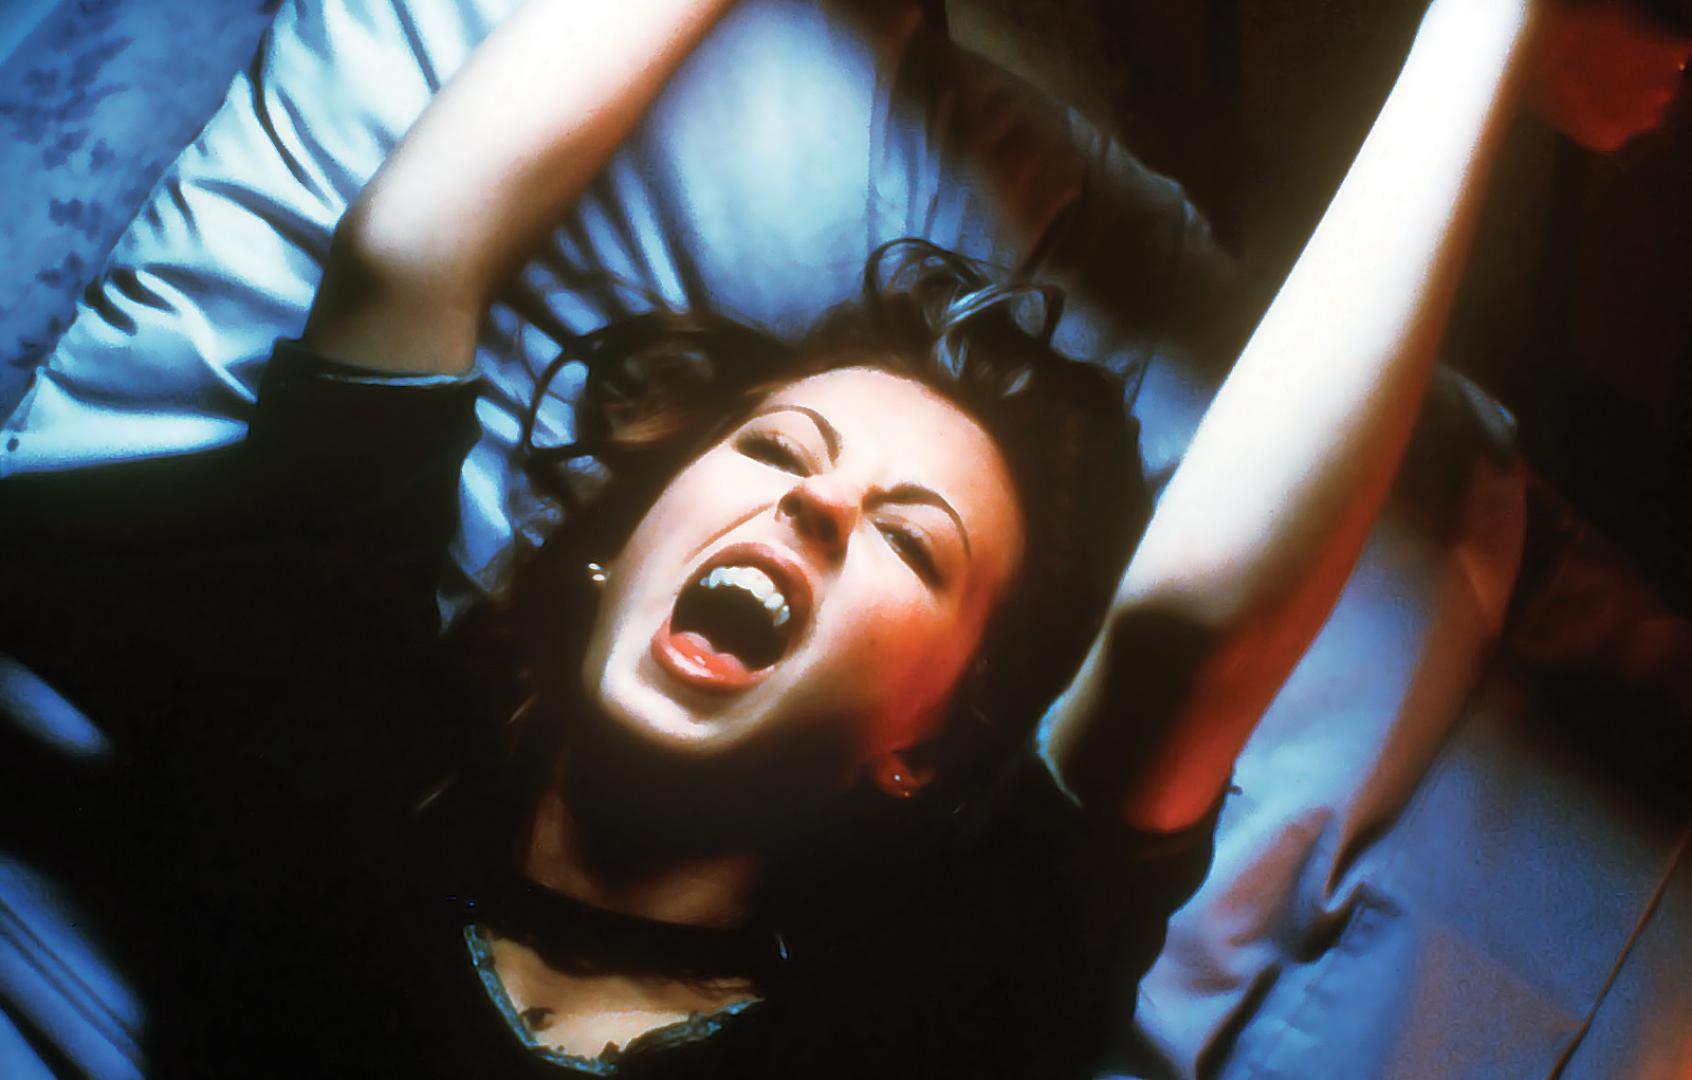 Ginger Snaps - Vérszomj (2000)